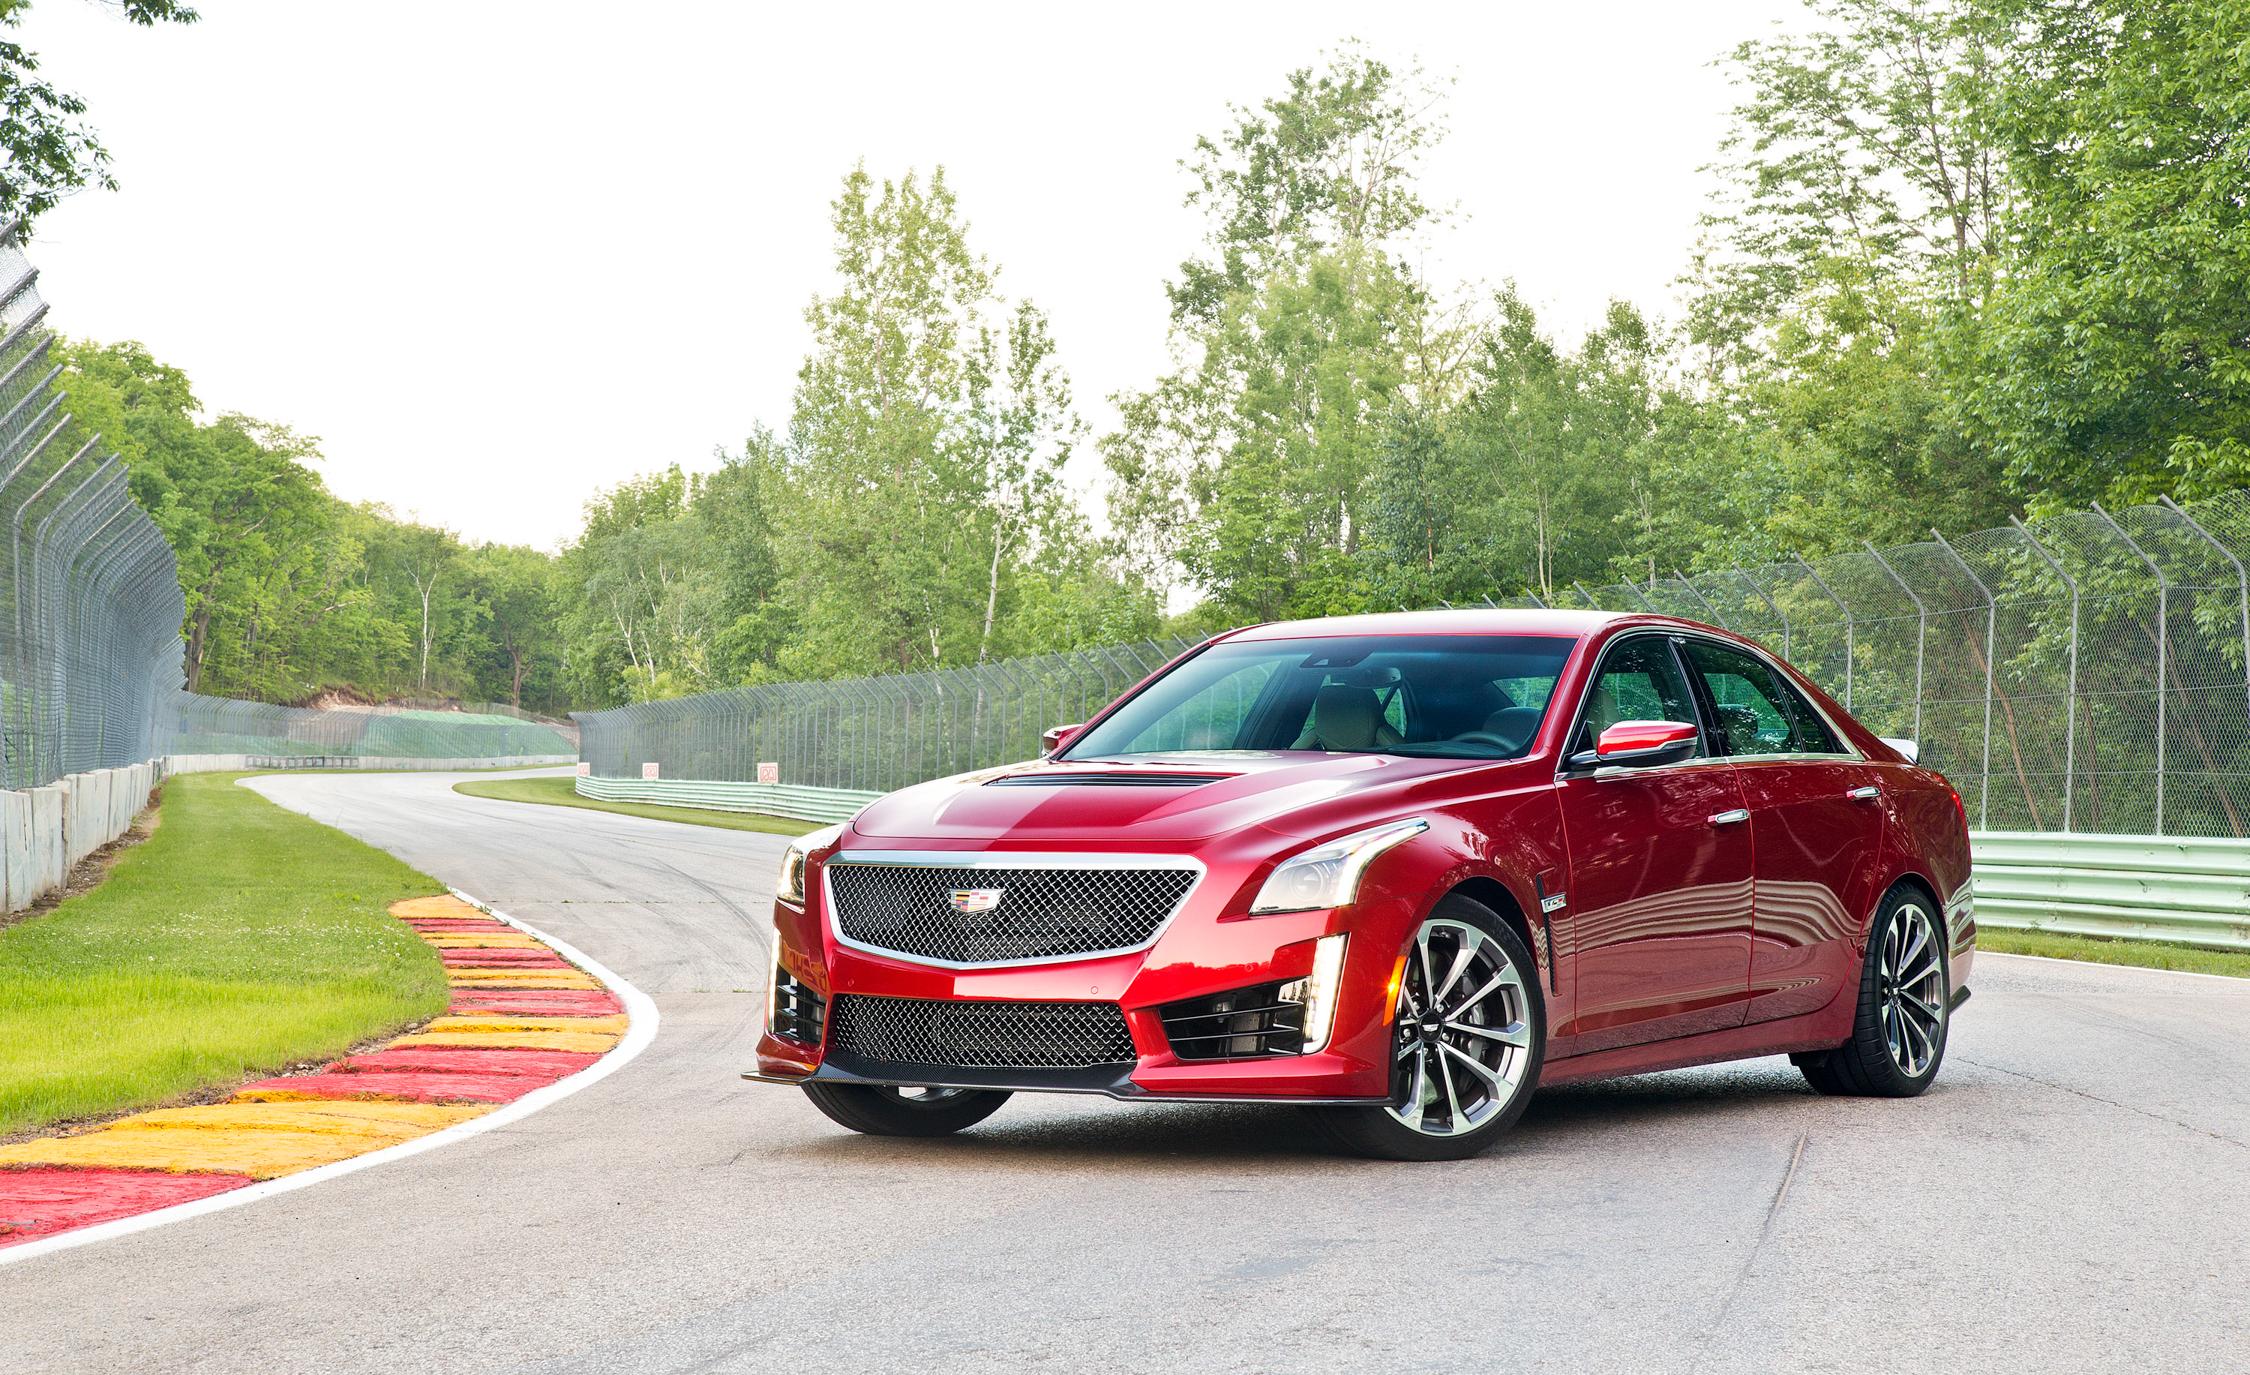 2016 Cadillac CTS-V Red Exterior